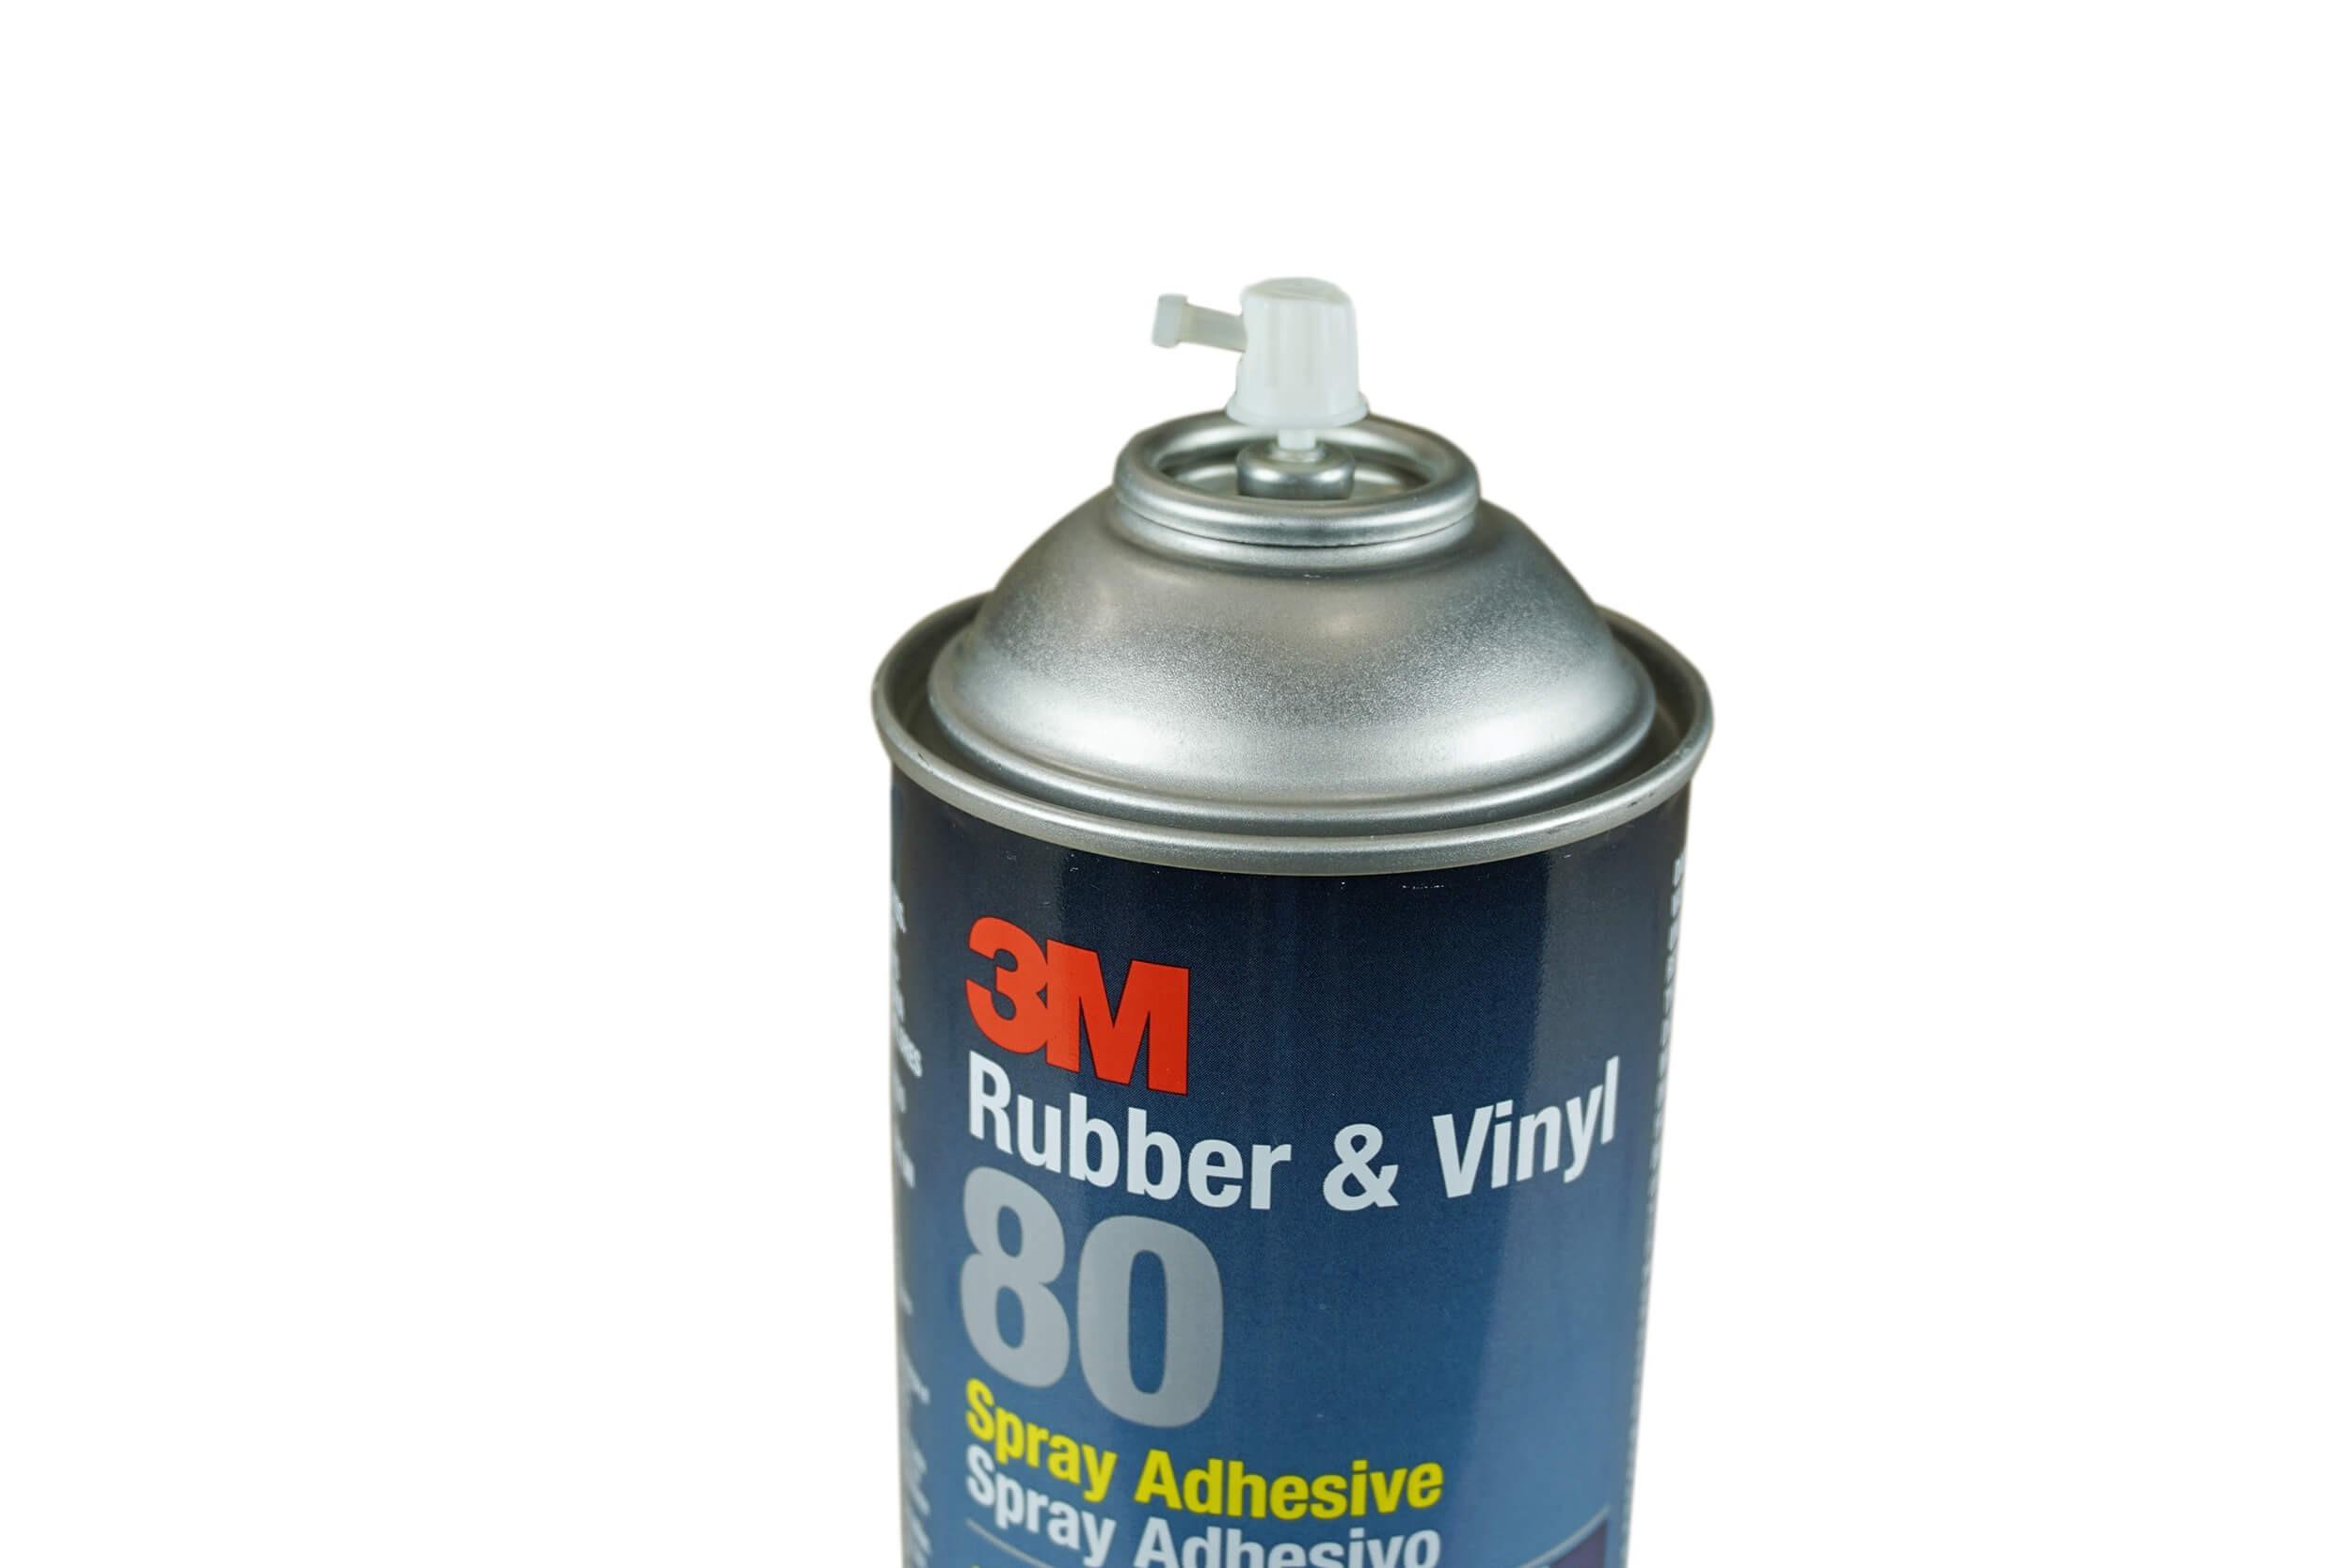 3m Rubber Amp Vinyl Spray Adhesive